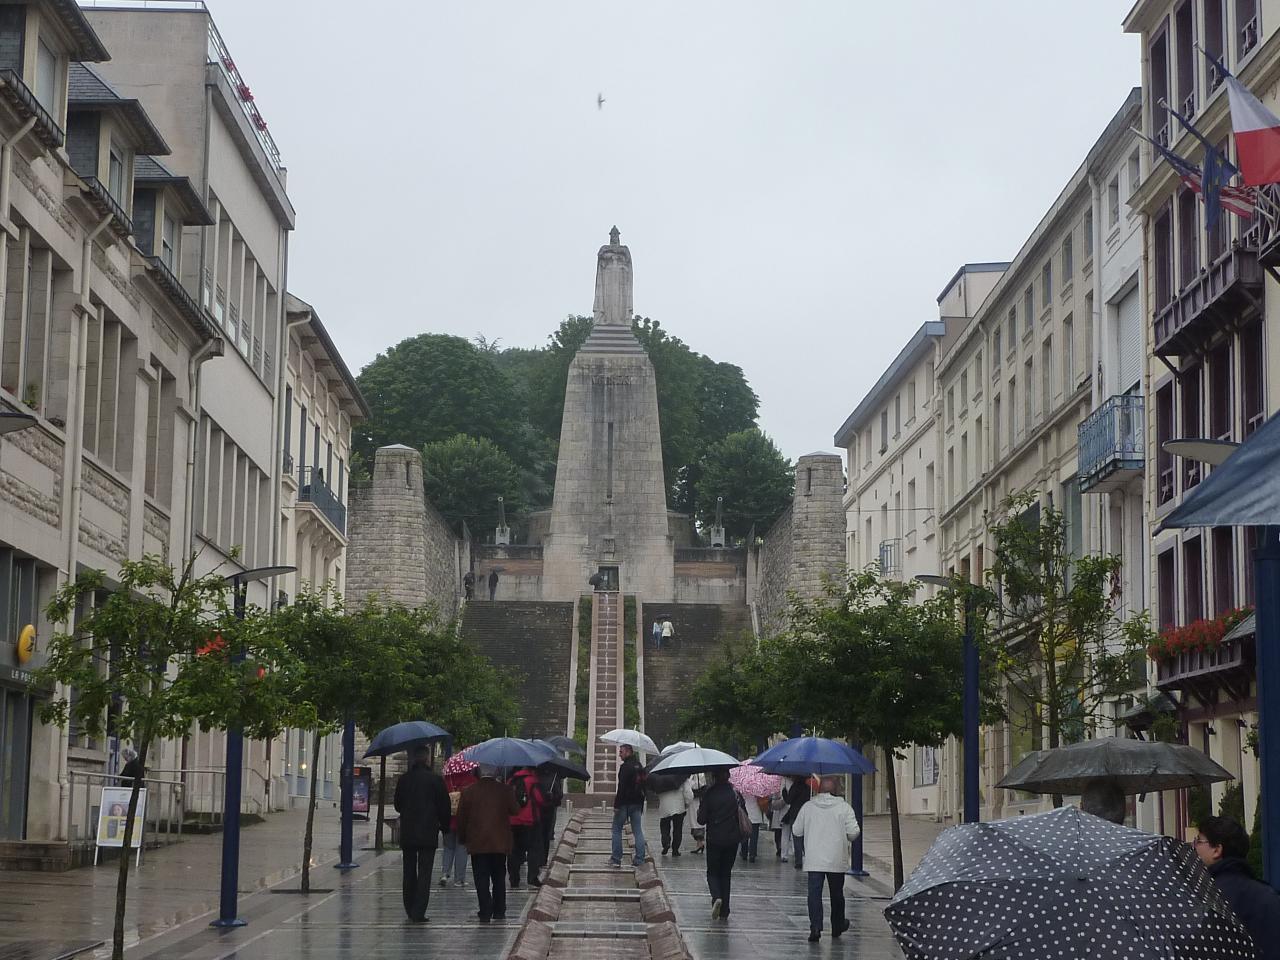 2012 07 13 Accueil de Juillet-Verdun  (3)